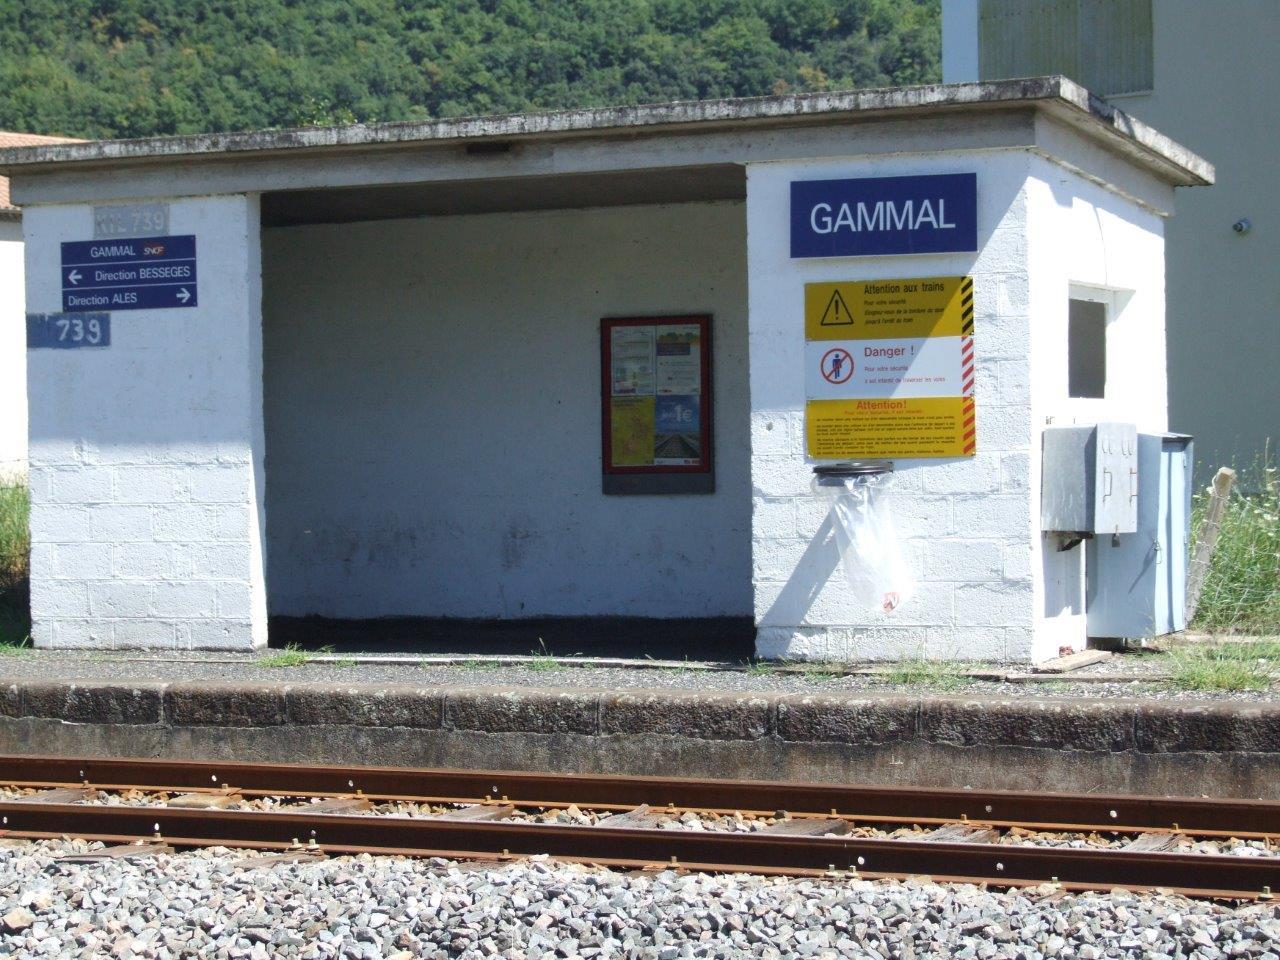 gare-de-gammal-train-station